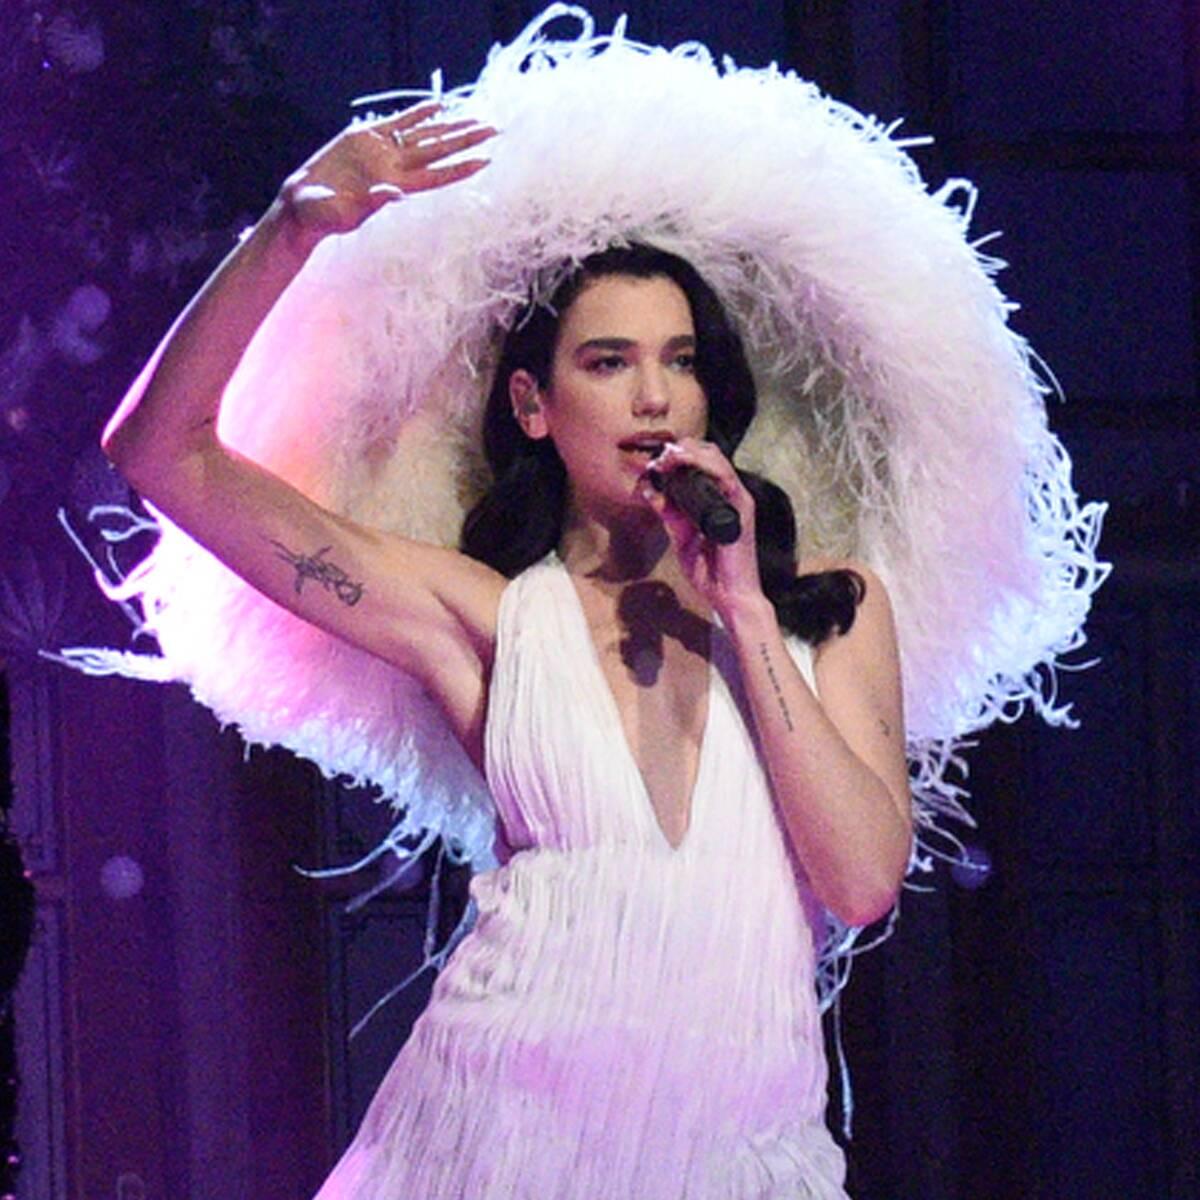 How Dua Lipa Kept Levitating to Become Pop Music's Golden Girl